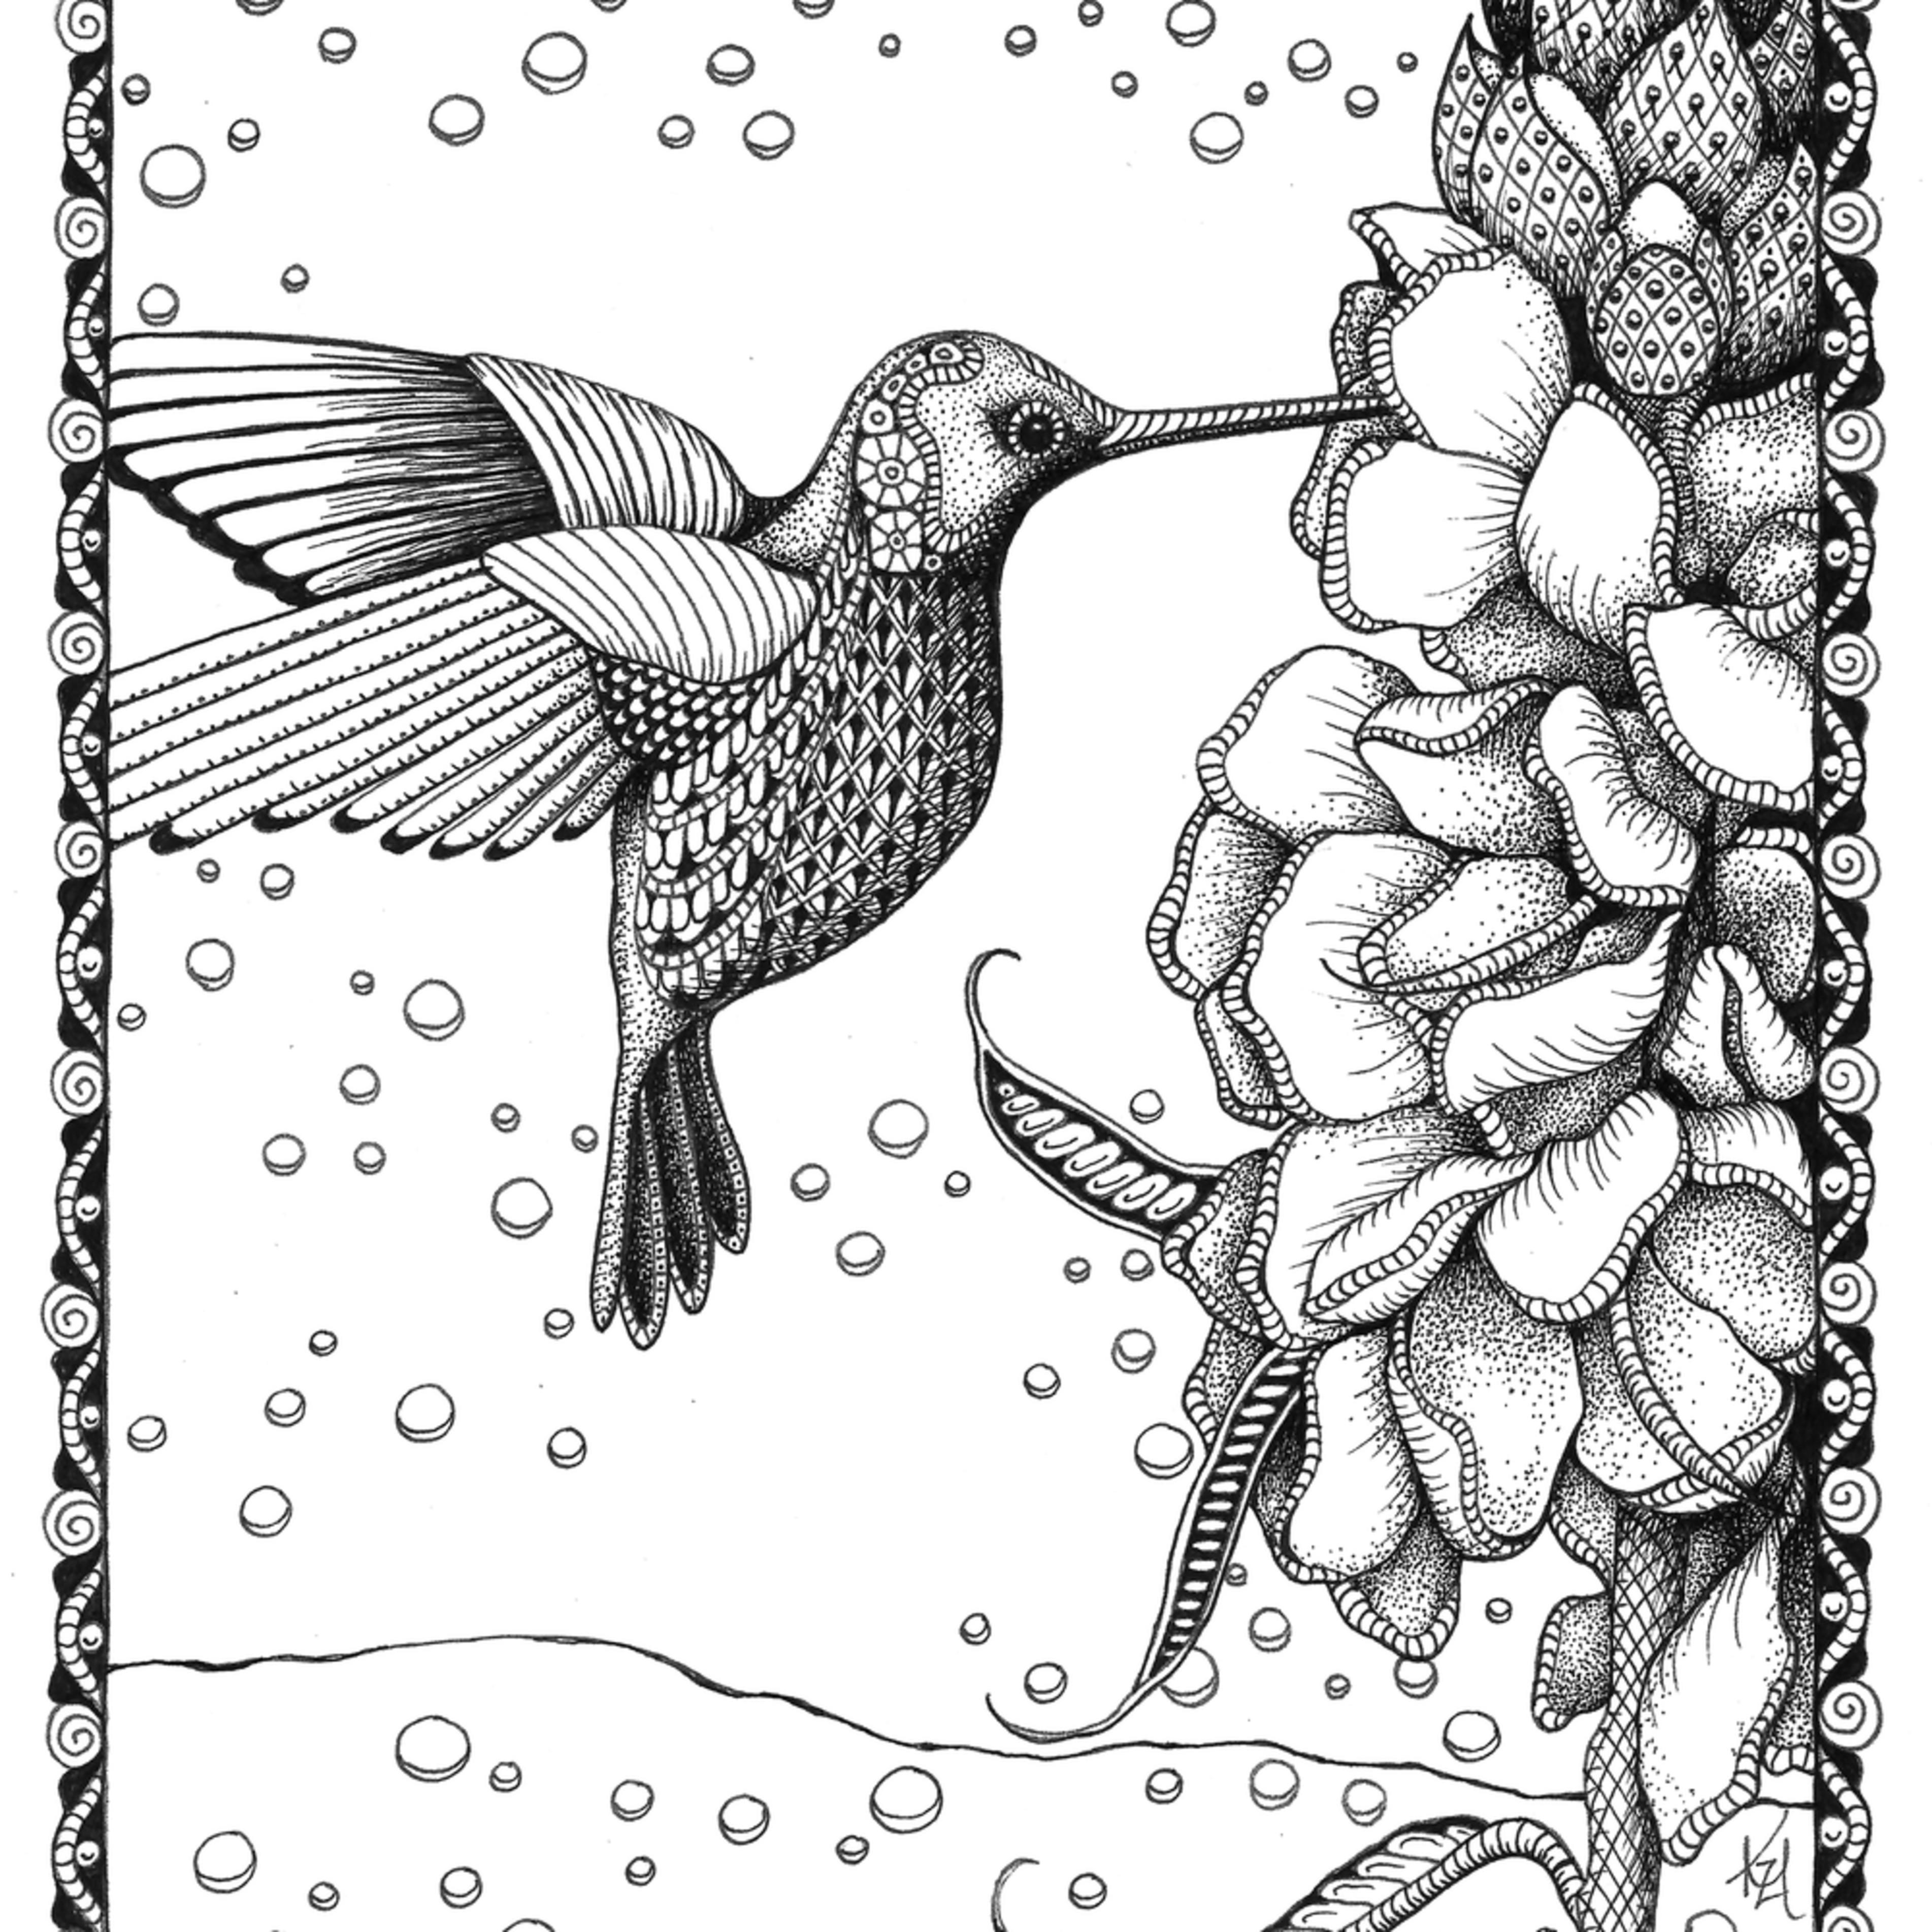 Hummingbird gladiolas cn1oxf